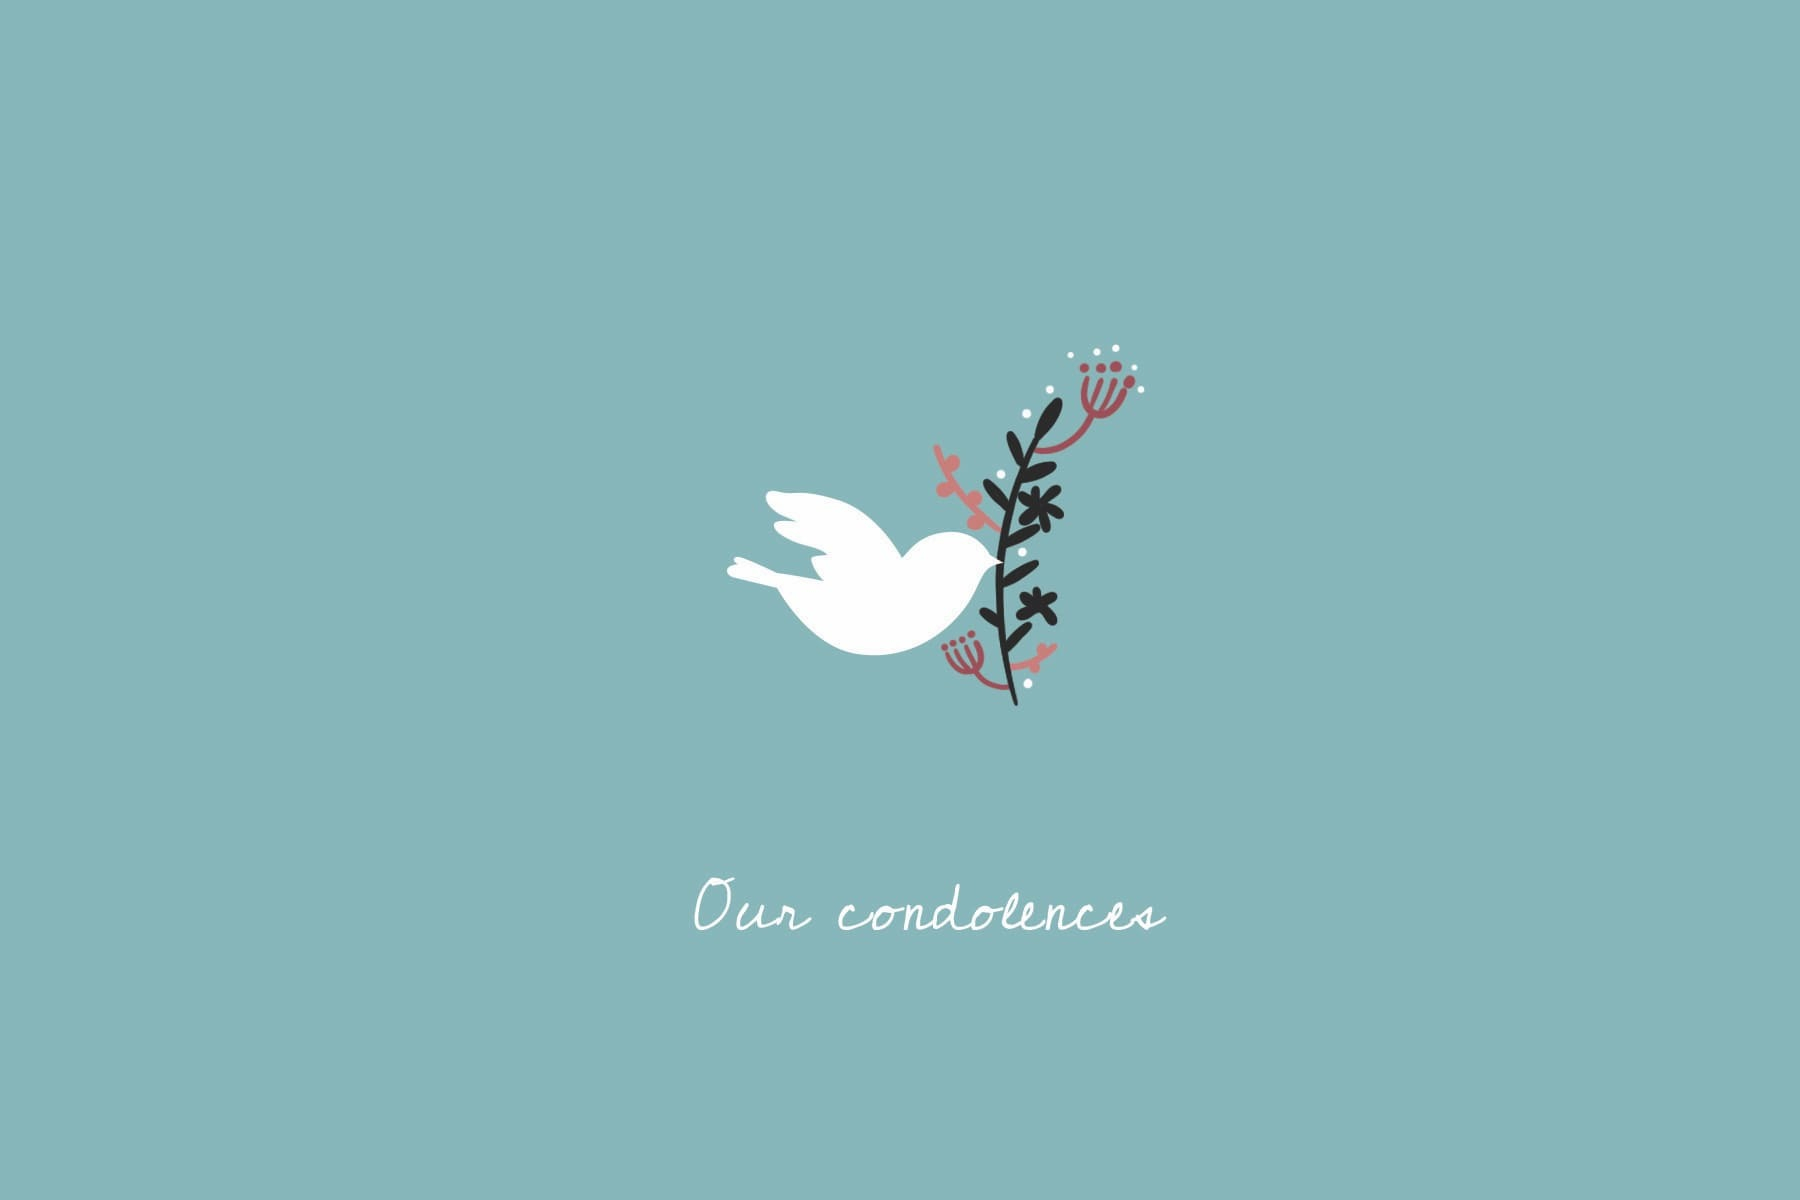 blue condoleances card with dove